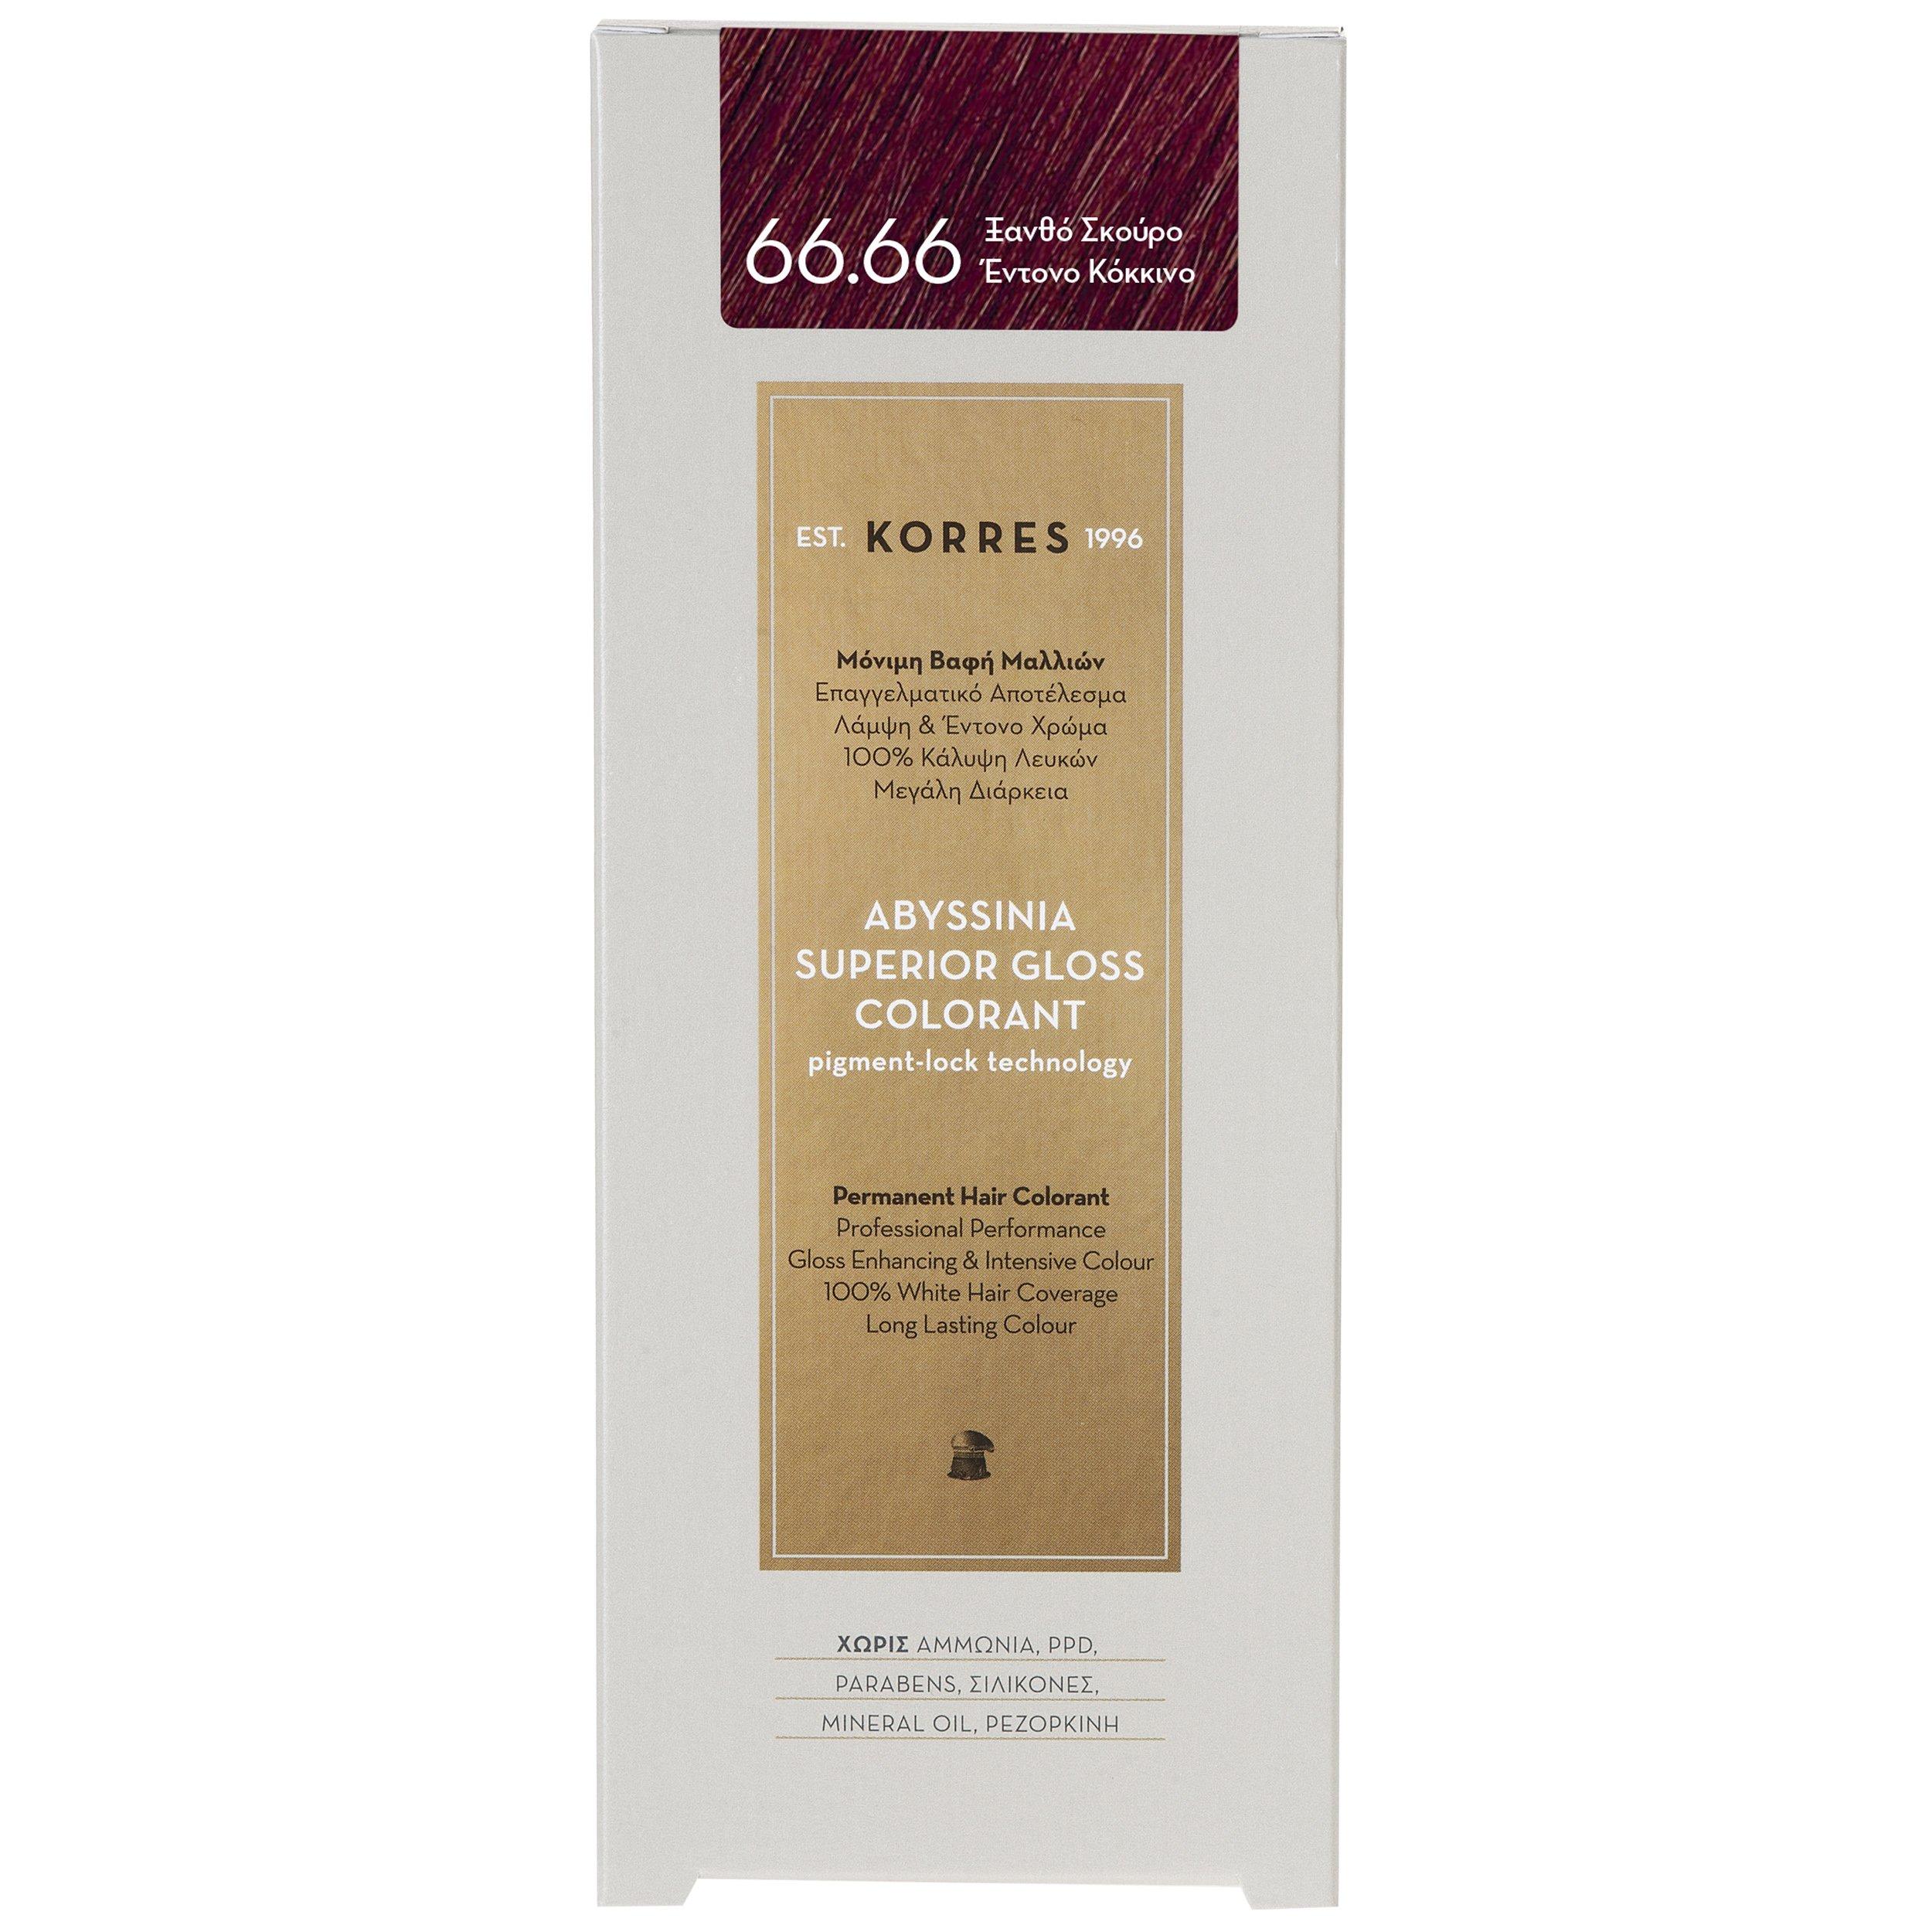 Korres Abyssinia Superior Gloss Colorant Επαγγελματικό Αποτέλεσμα Λάμψη & Έντονο Χρώμα – 66.66 ΞΑΝΘΟ ΣΚΟΥΡΟ ΕΝΤΟΝΟ ΚΟΚΚΙΝΟ